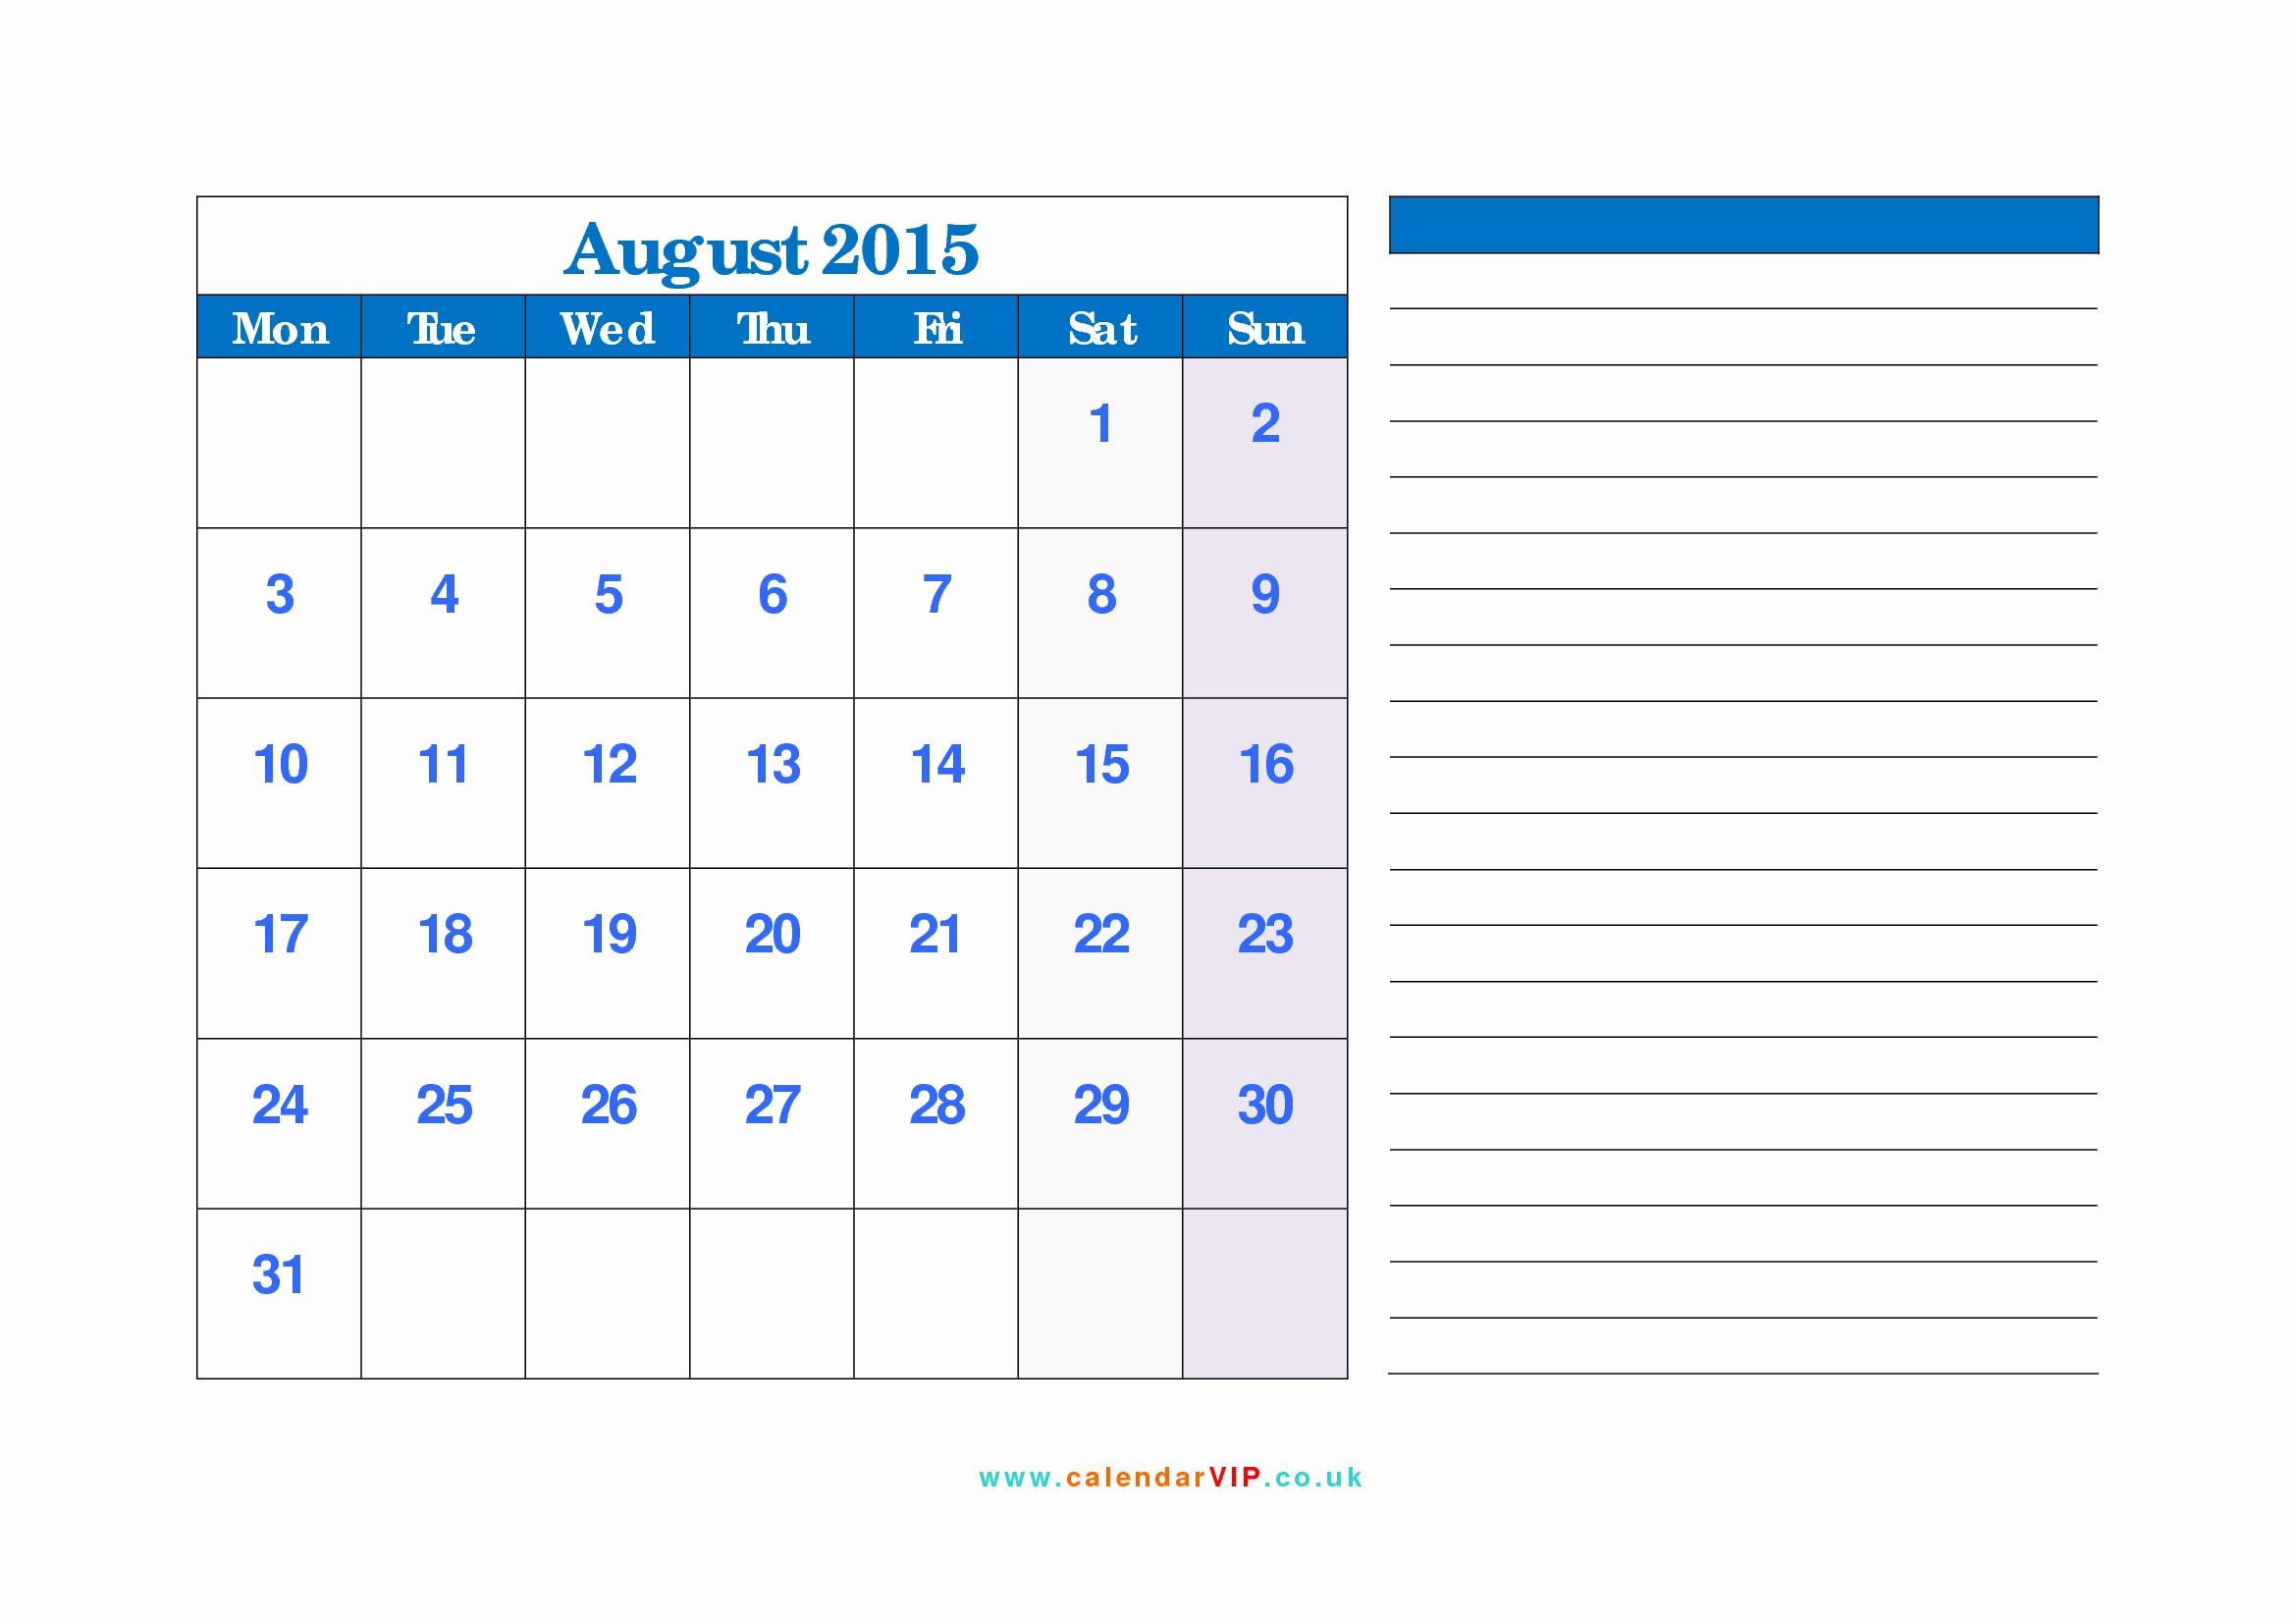 Free Calendar Templates August 2015 Beautiful August 2015 Calendar Free Monthly Calendar Templates for Uk